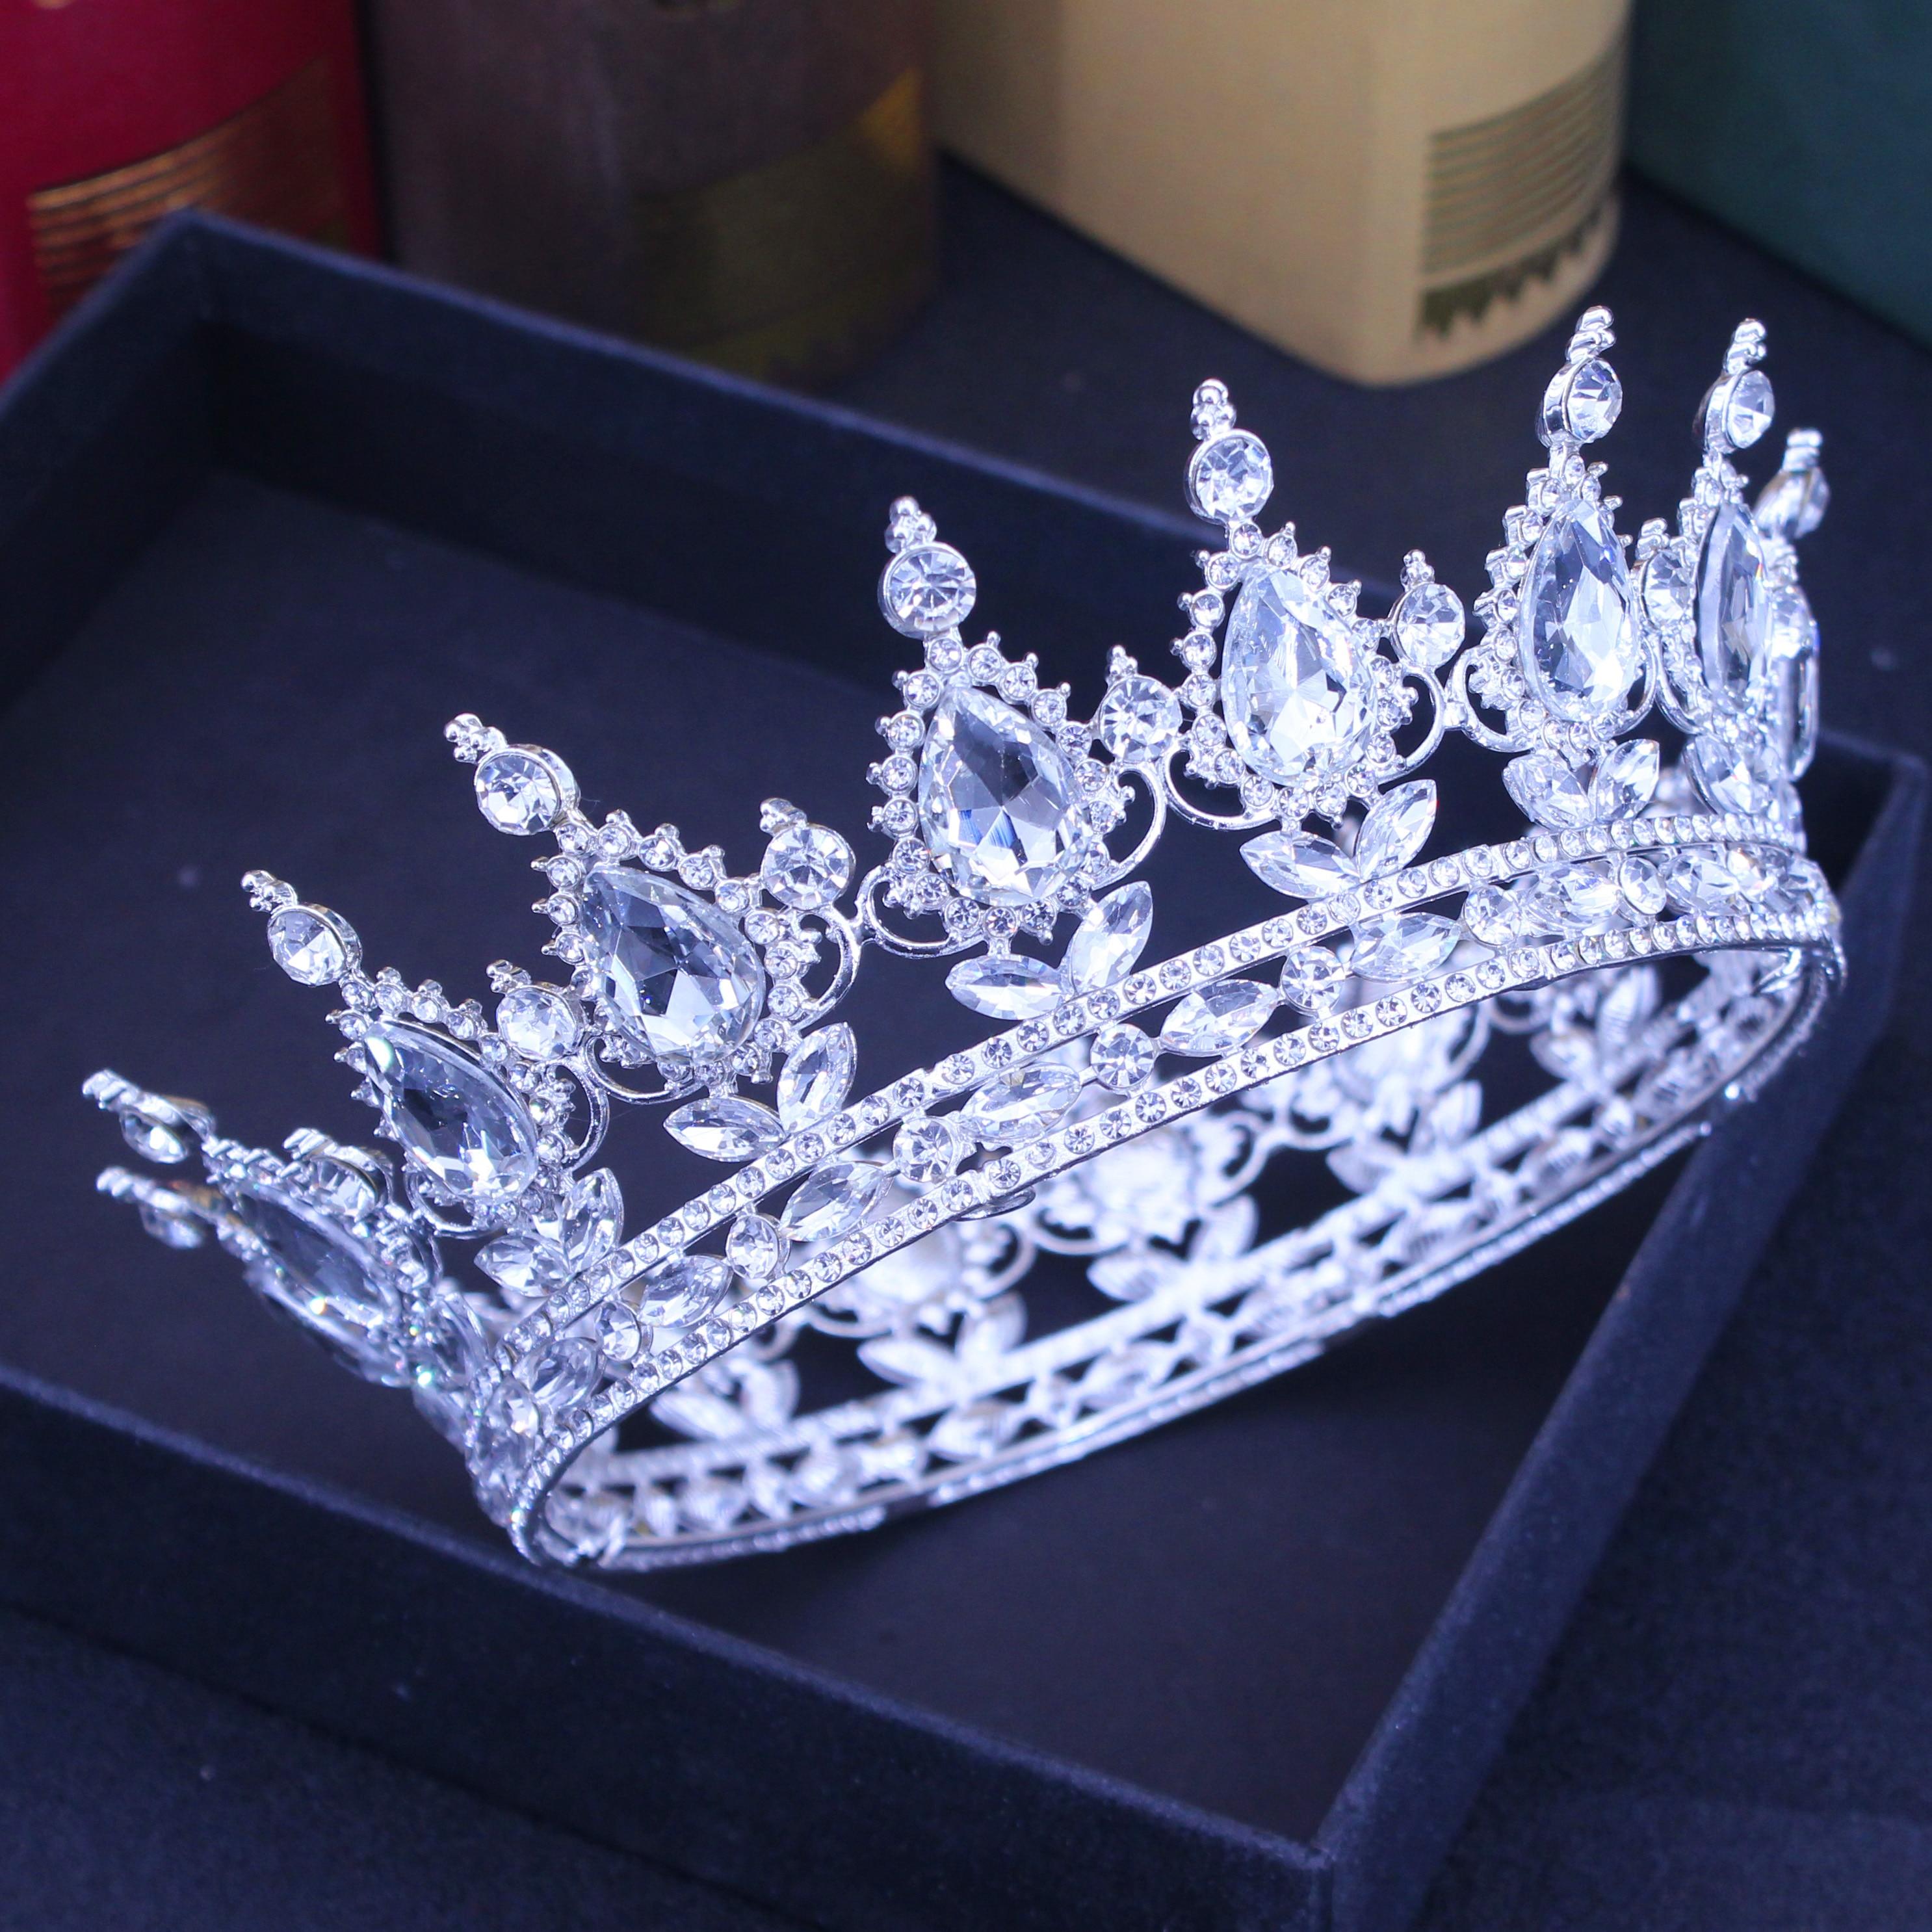 Rainha rei casamento tiara coroa nupcial do vintage cristal diadema feminino/masculino enfeites de cabelo noiva strass cabeça jóias acessórios